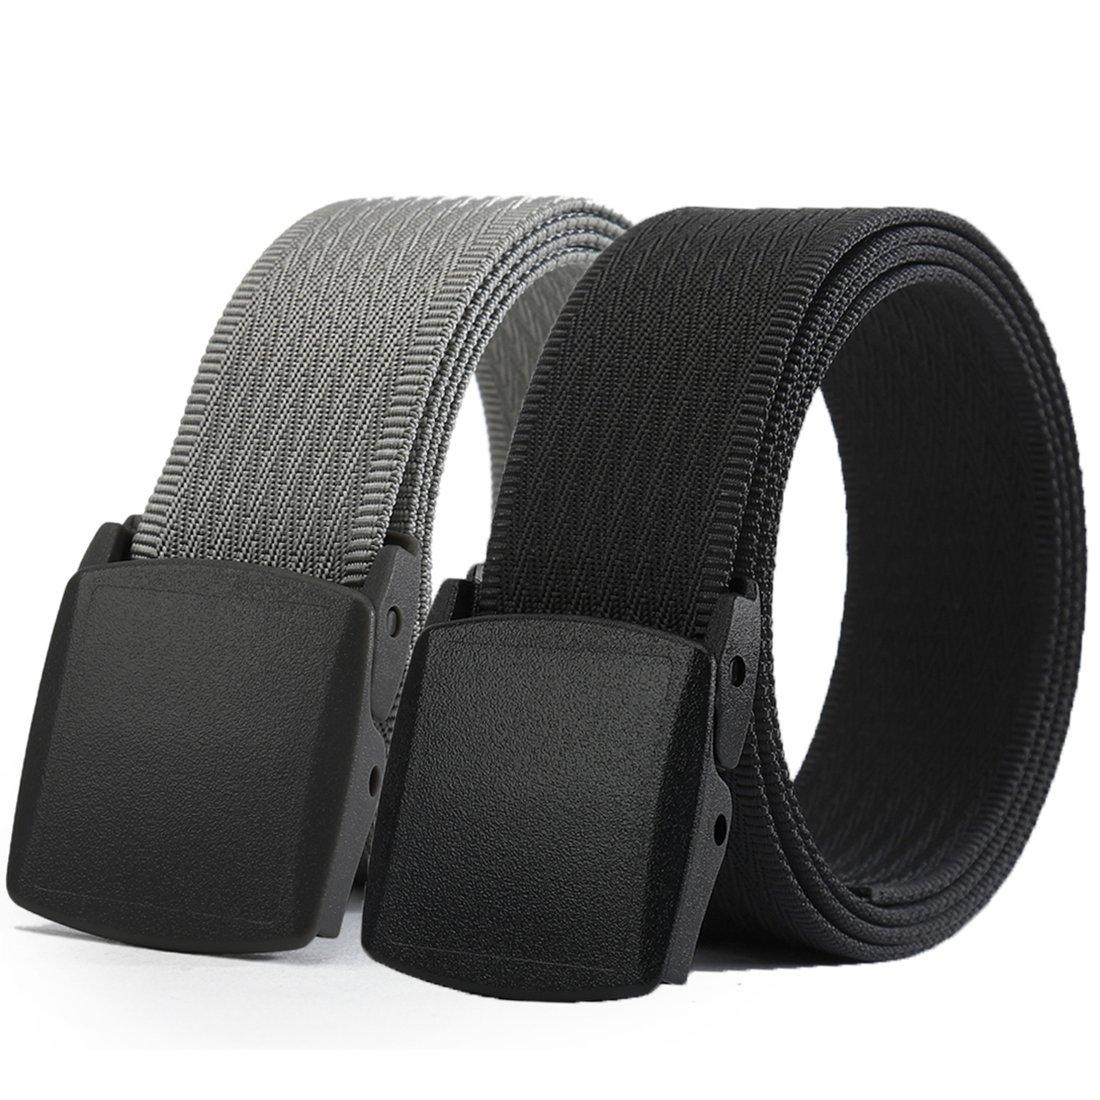 WYuZe Mens Nylon Webbing Belt No Metal Buckle Military Tactical Canvas Web Belt